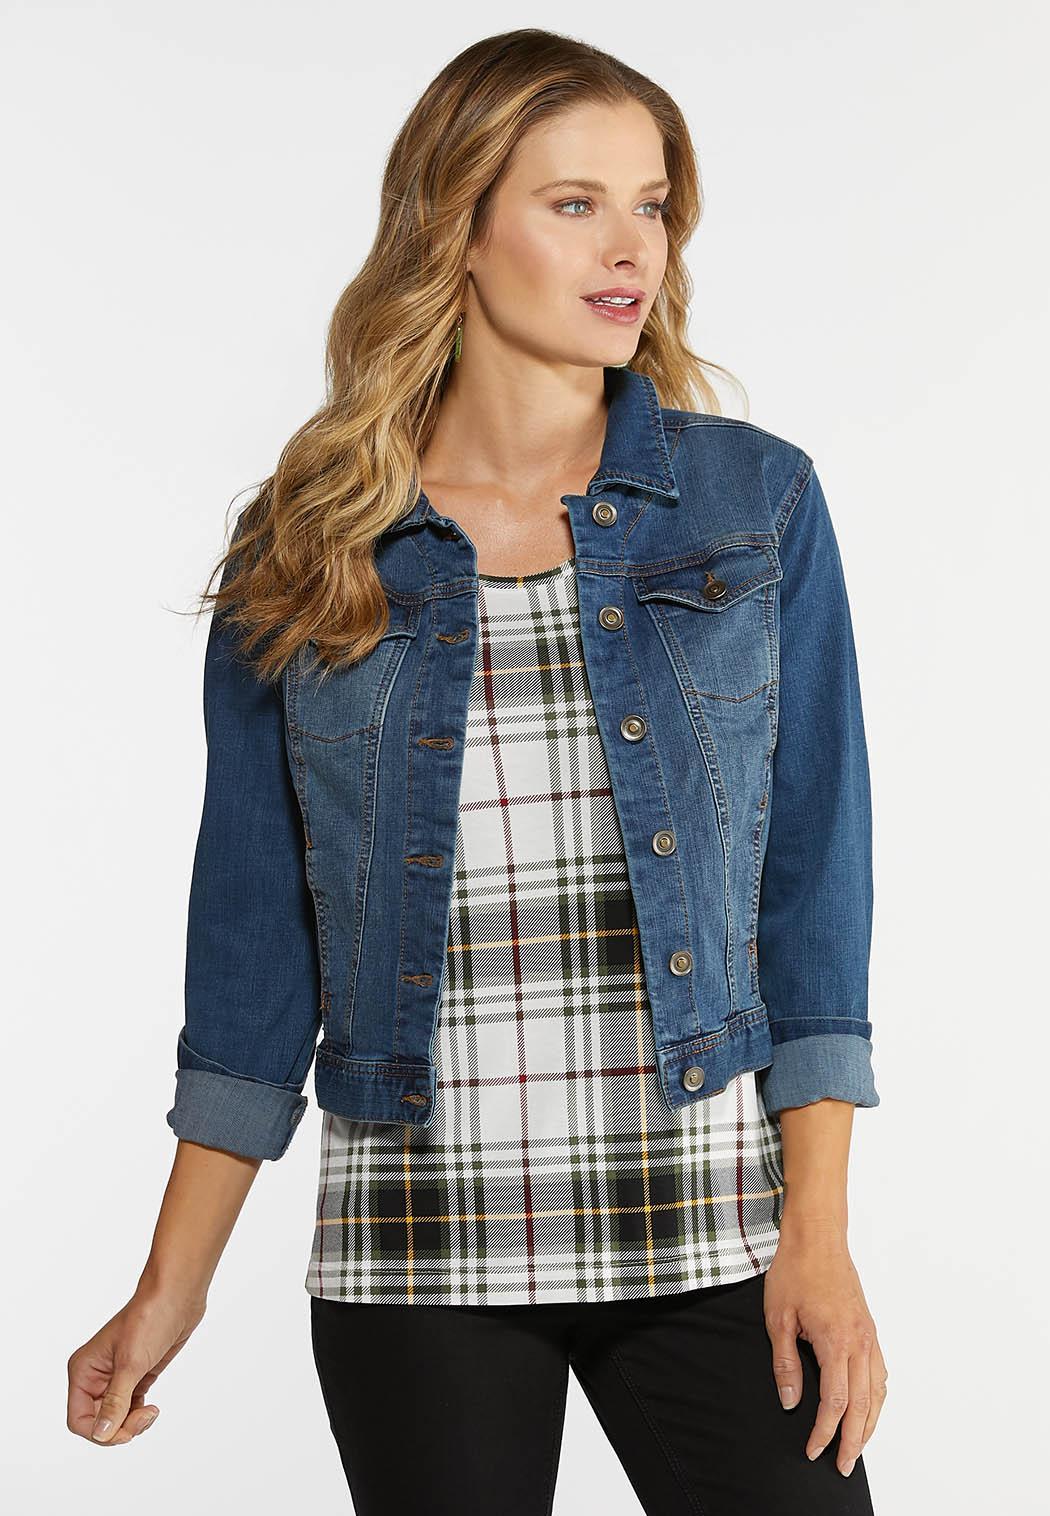 Plus Size Essential Denim Jacket